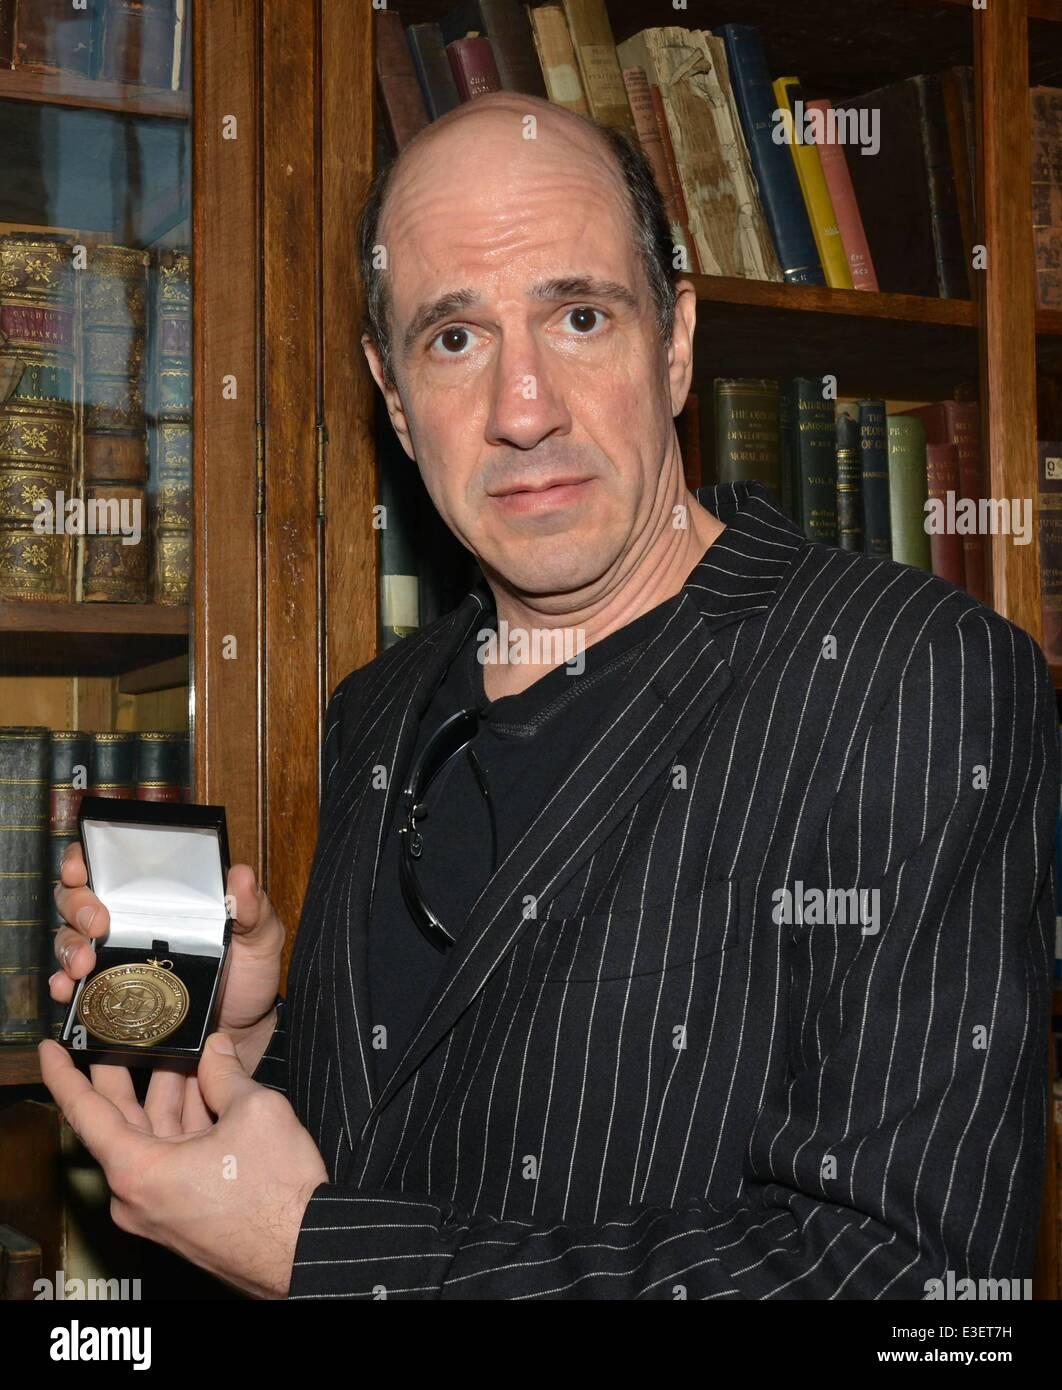 scrubs actor sam lloyd receives the burke medal for outstanding